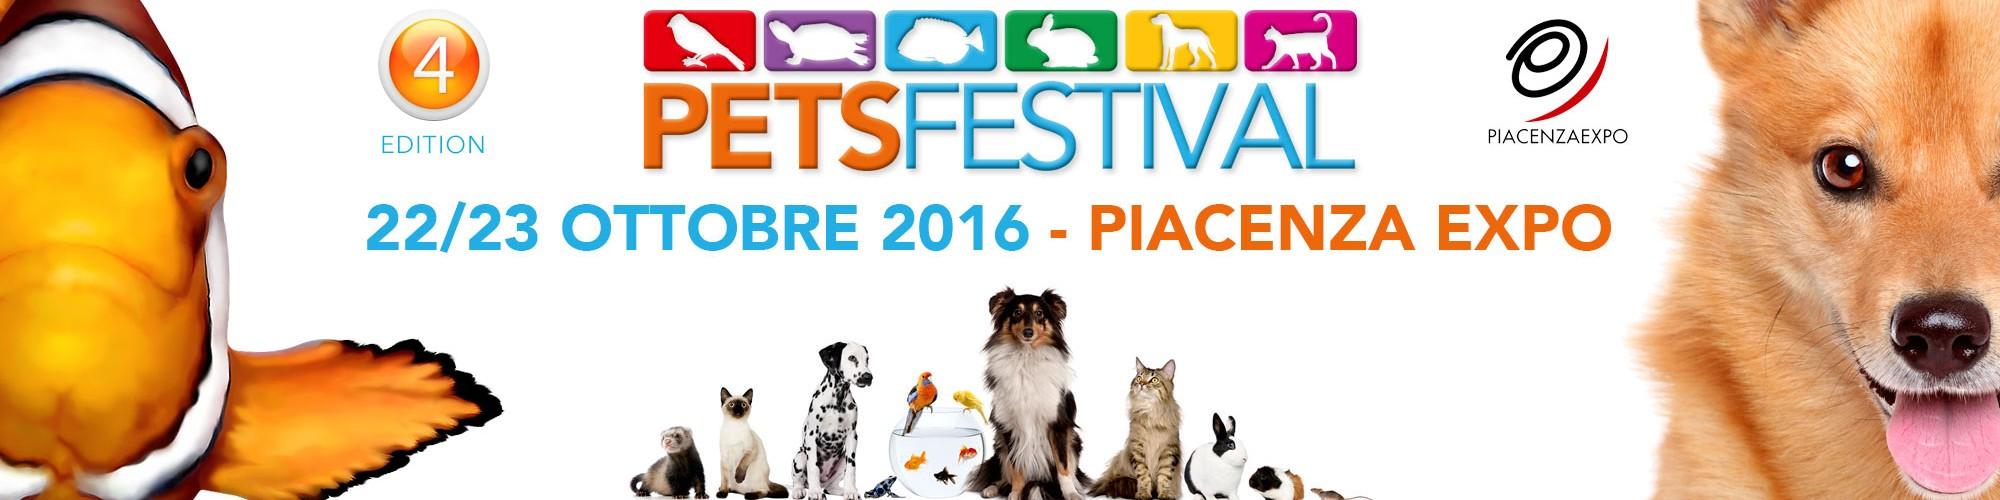 logo_petsfestival